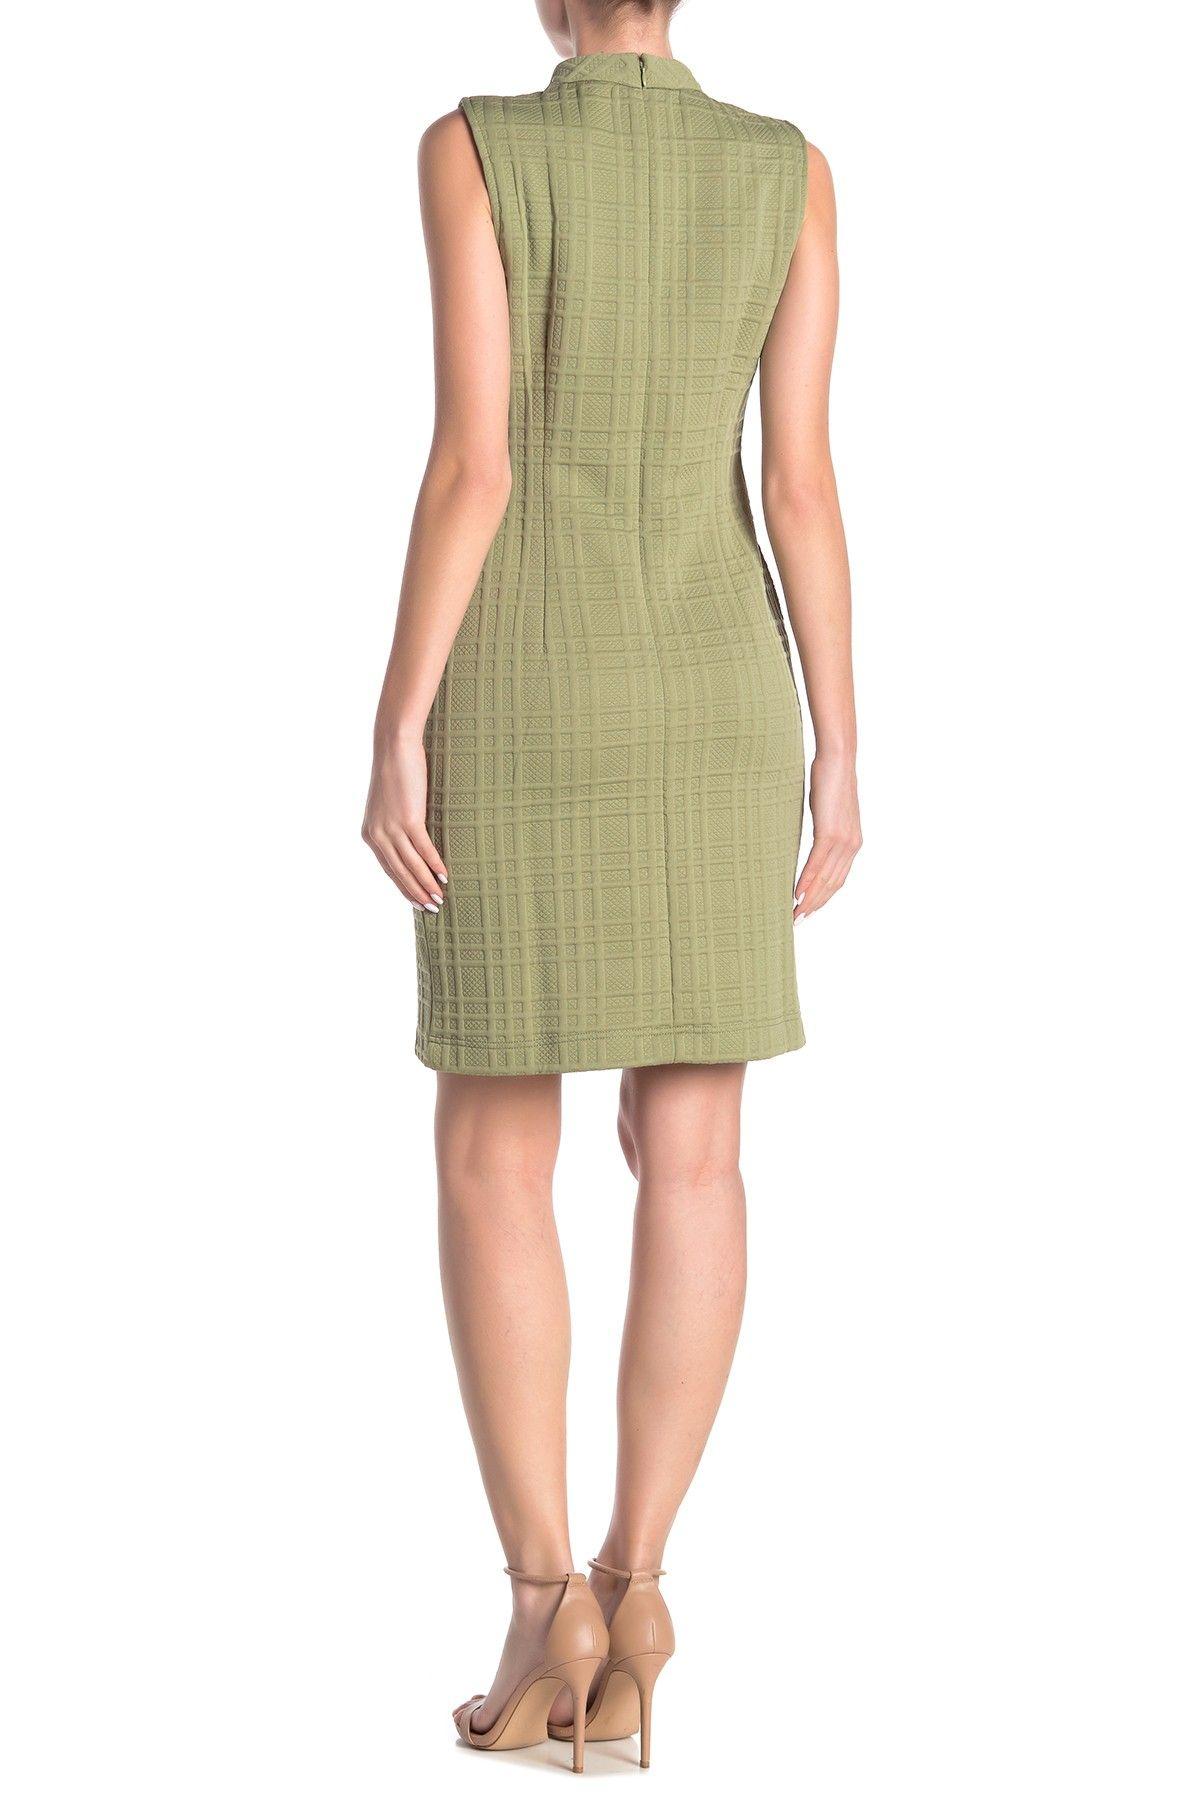 Sharagano Waffle Knit Dress Hautelook Knit Dress Nordstrom Dresses Dresses [ 1800 x 1200 Pixel ]